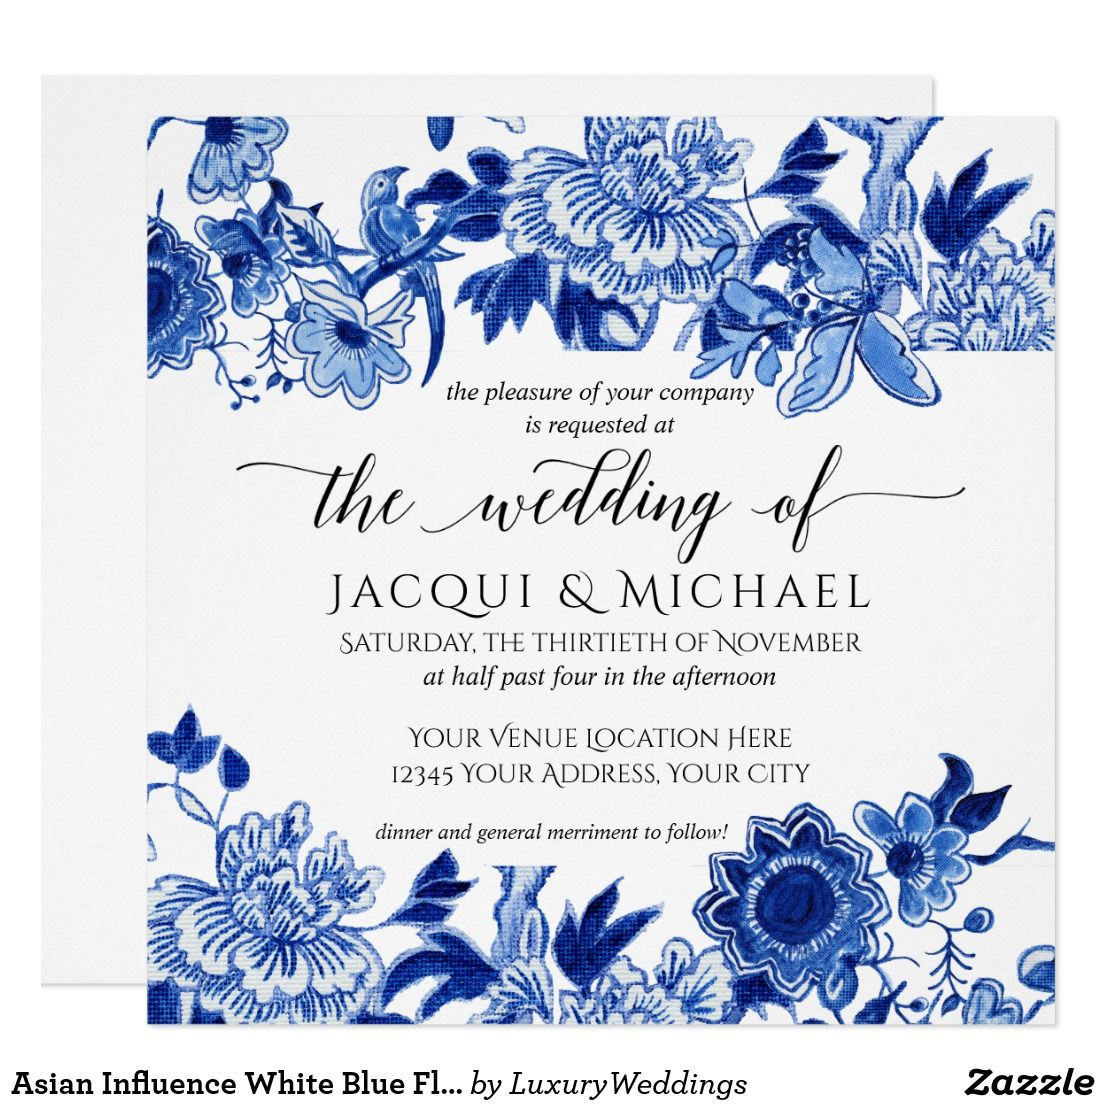 Asian Influence White Blue Floral Wedding Artwork Invitation Zazzle Com Floral Bridal Shower Invitations Wedding Artwork Blue Bridal Shower